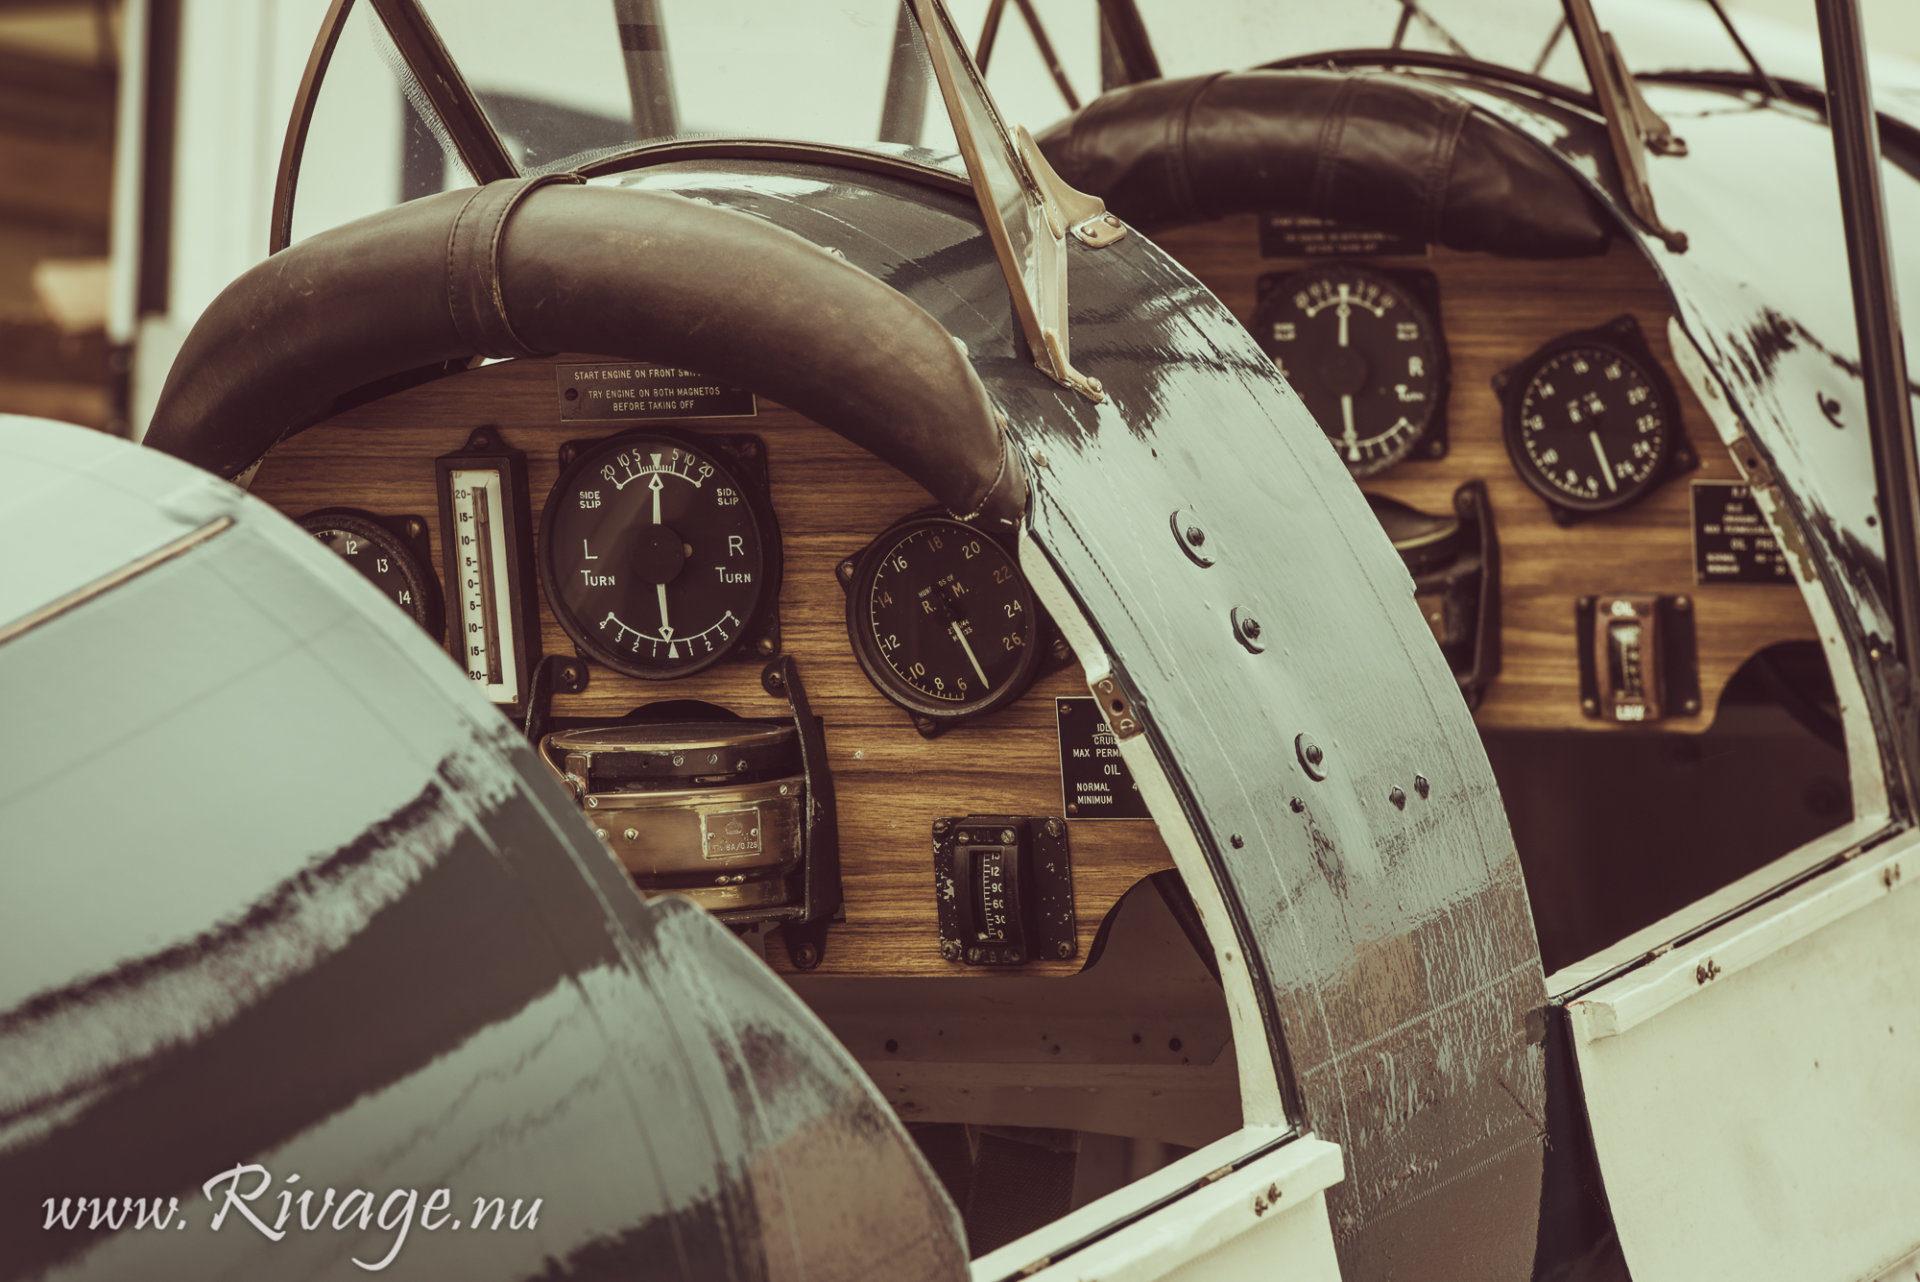 cockpit vintage dubbeldekker